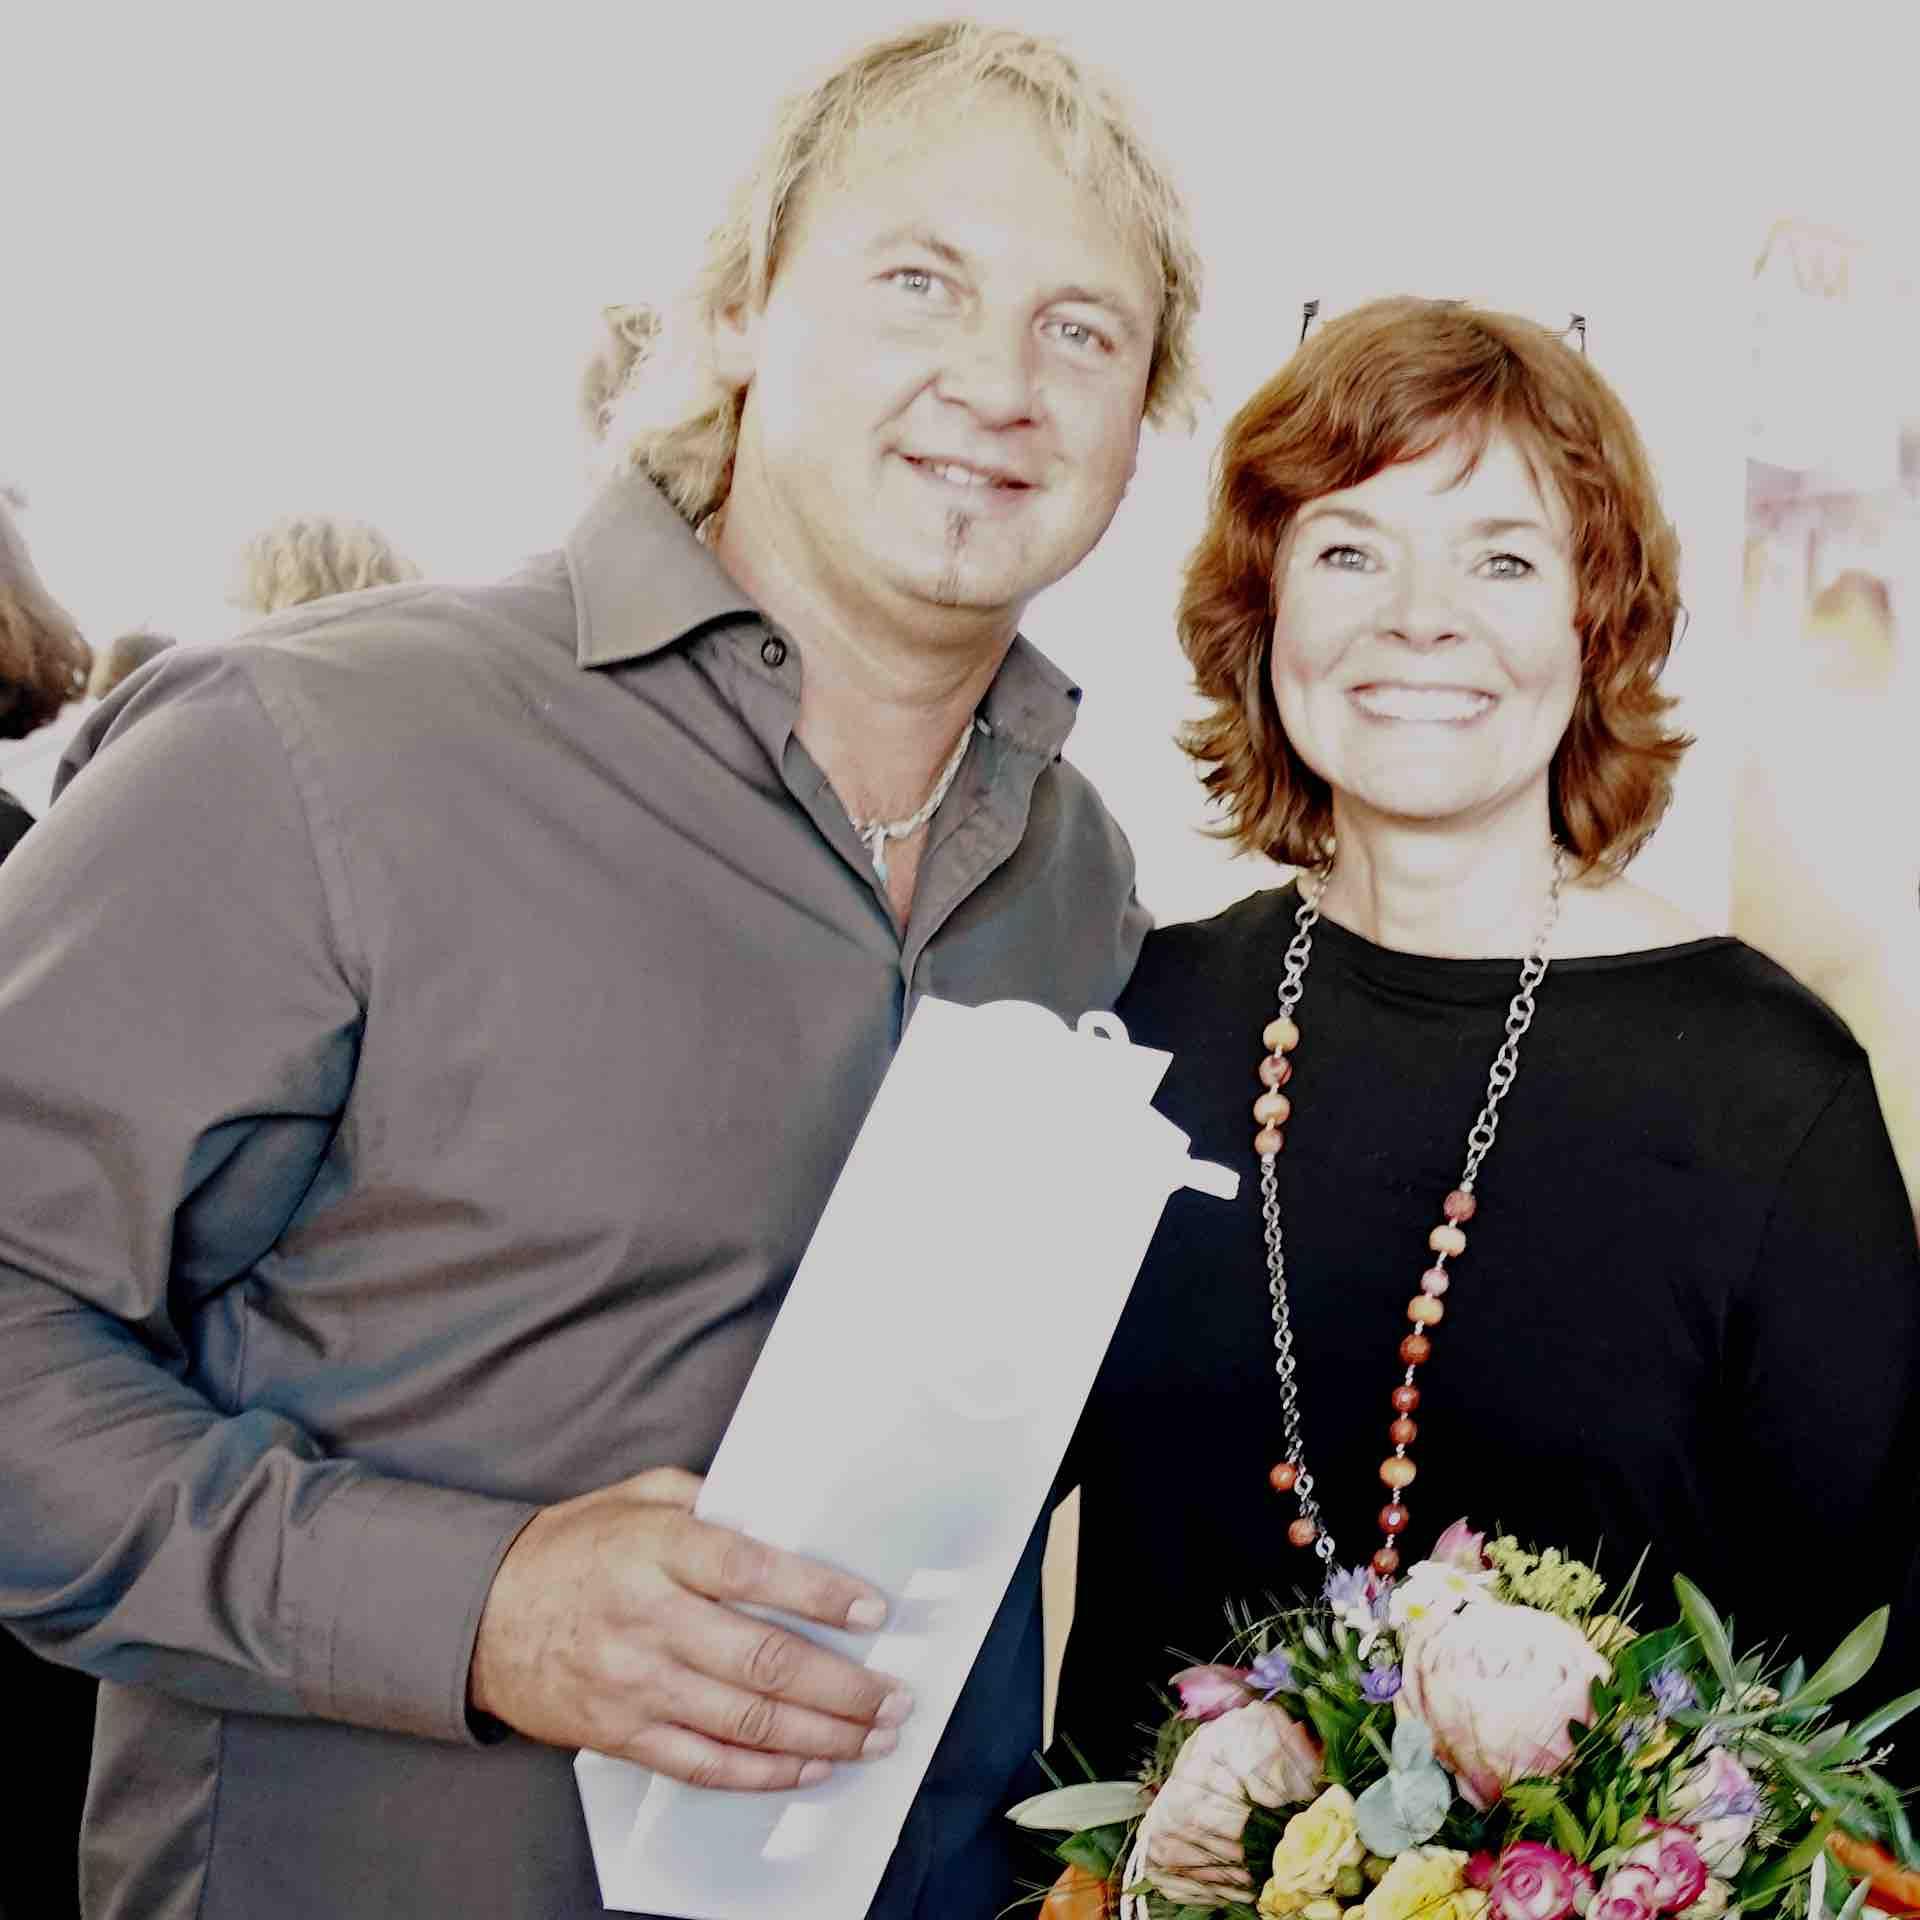 christinart - Vernissage mit Uwe Köhle